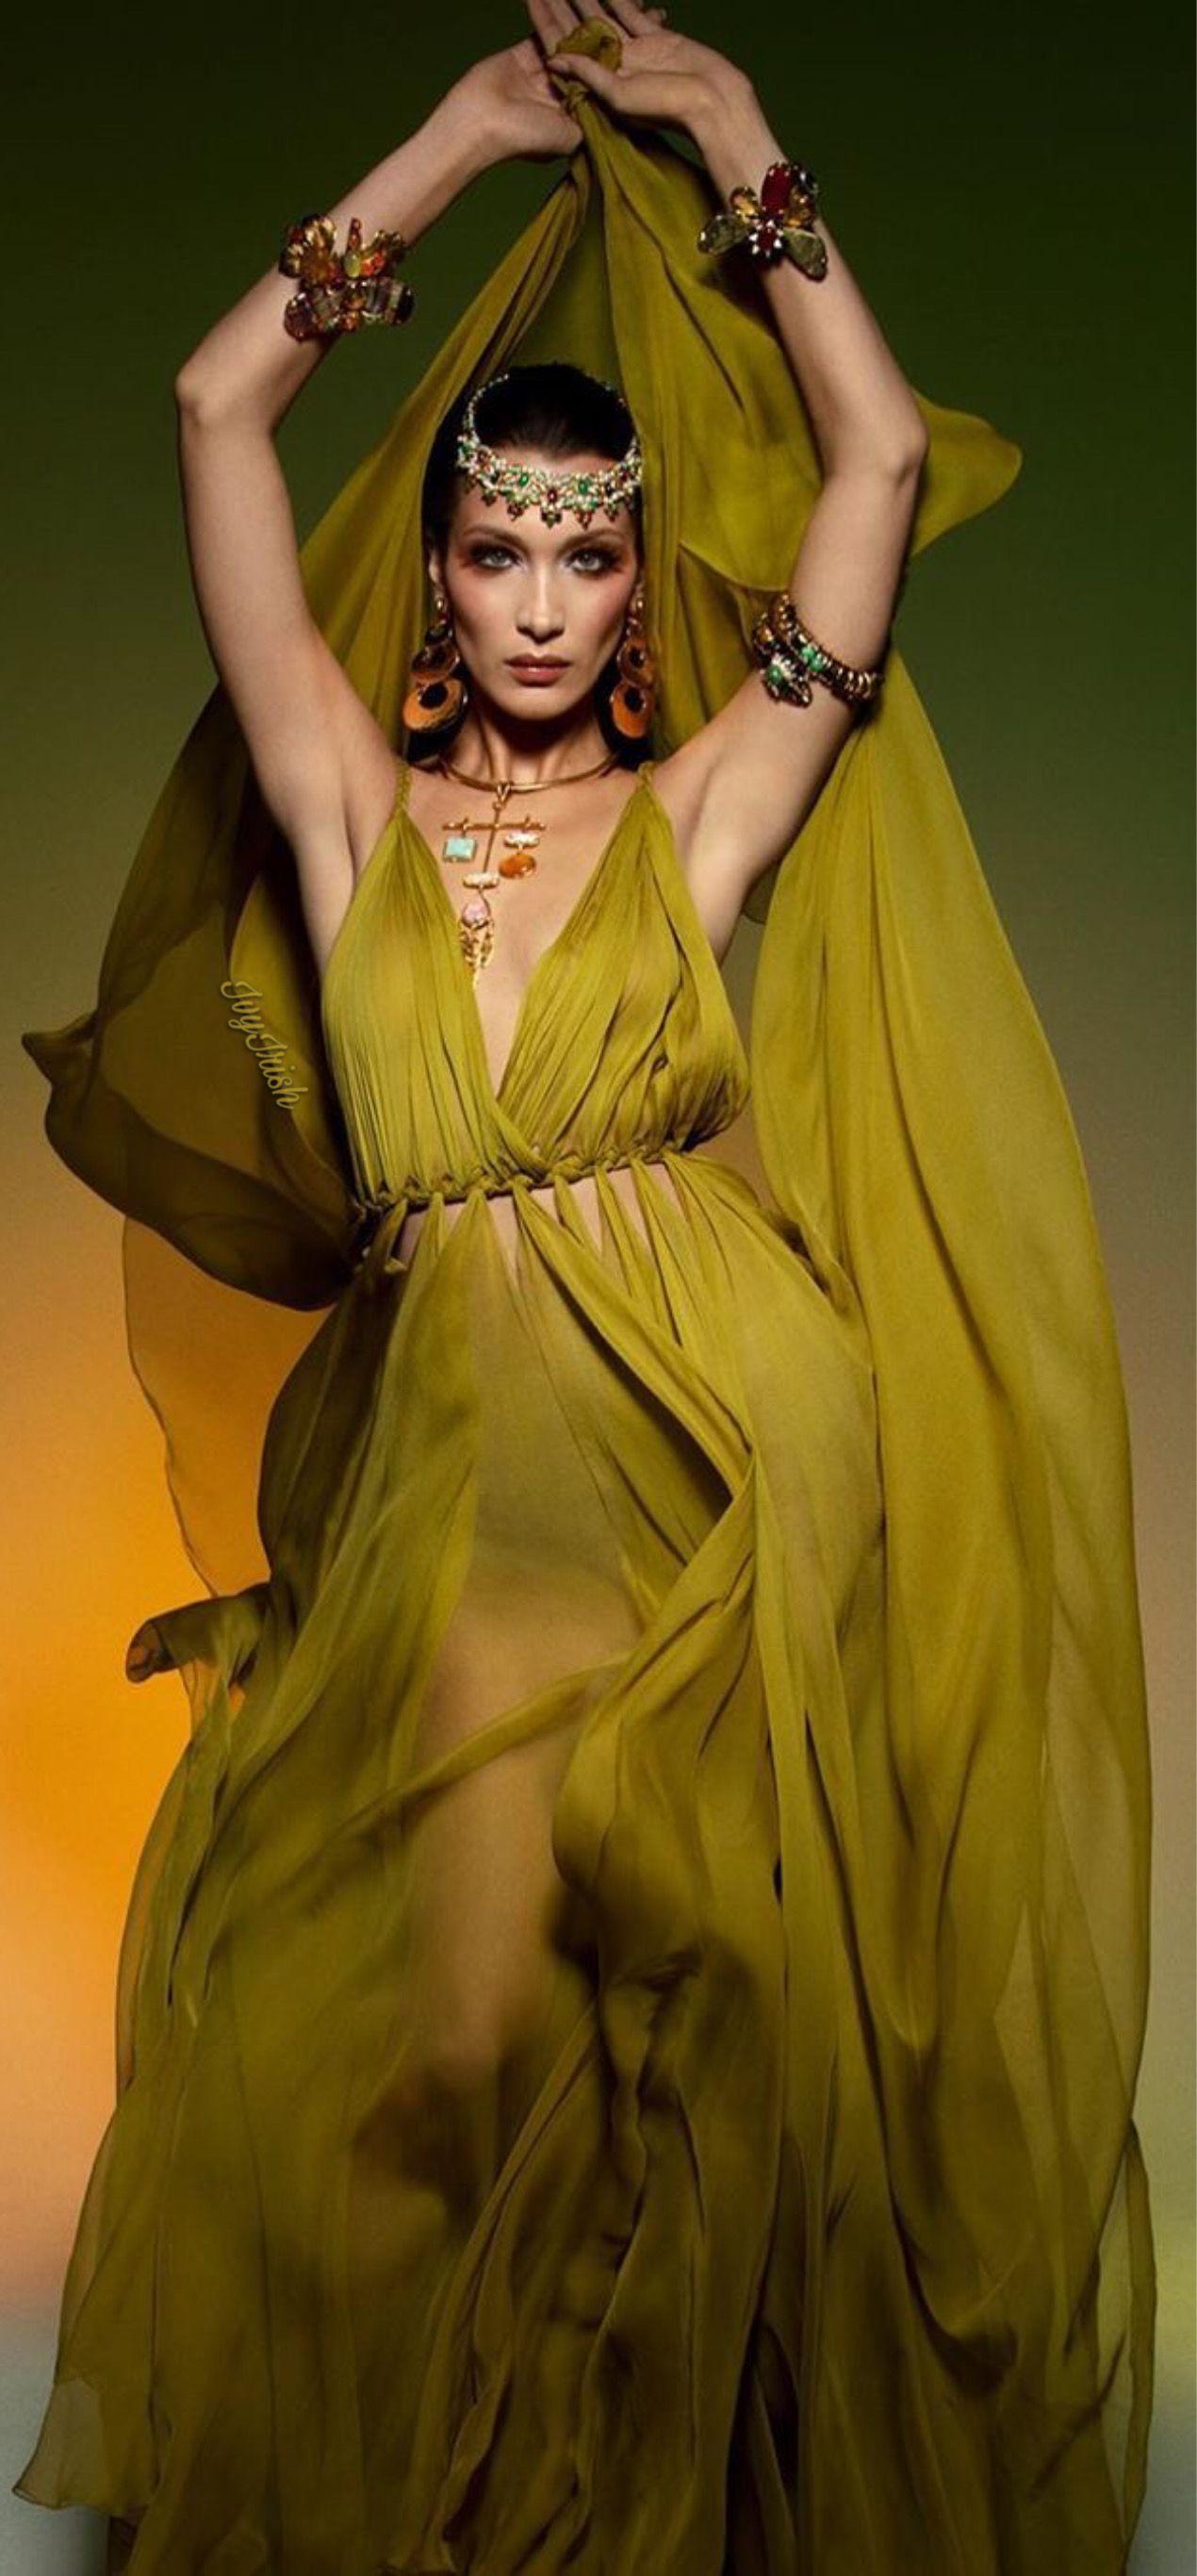 #dior #bellahadid #vogueparis #2020 #fashion